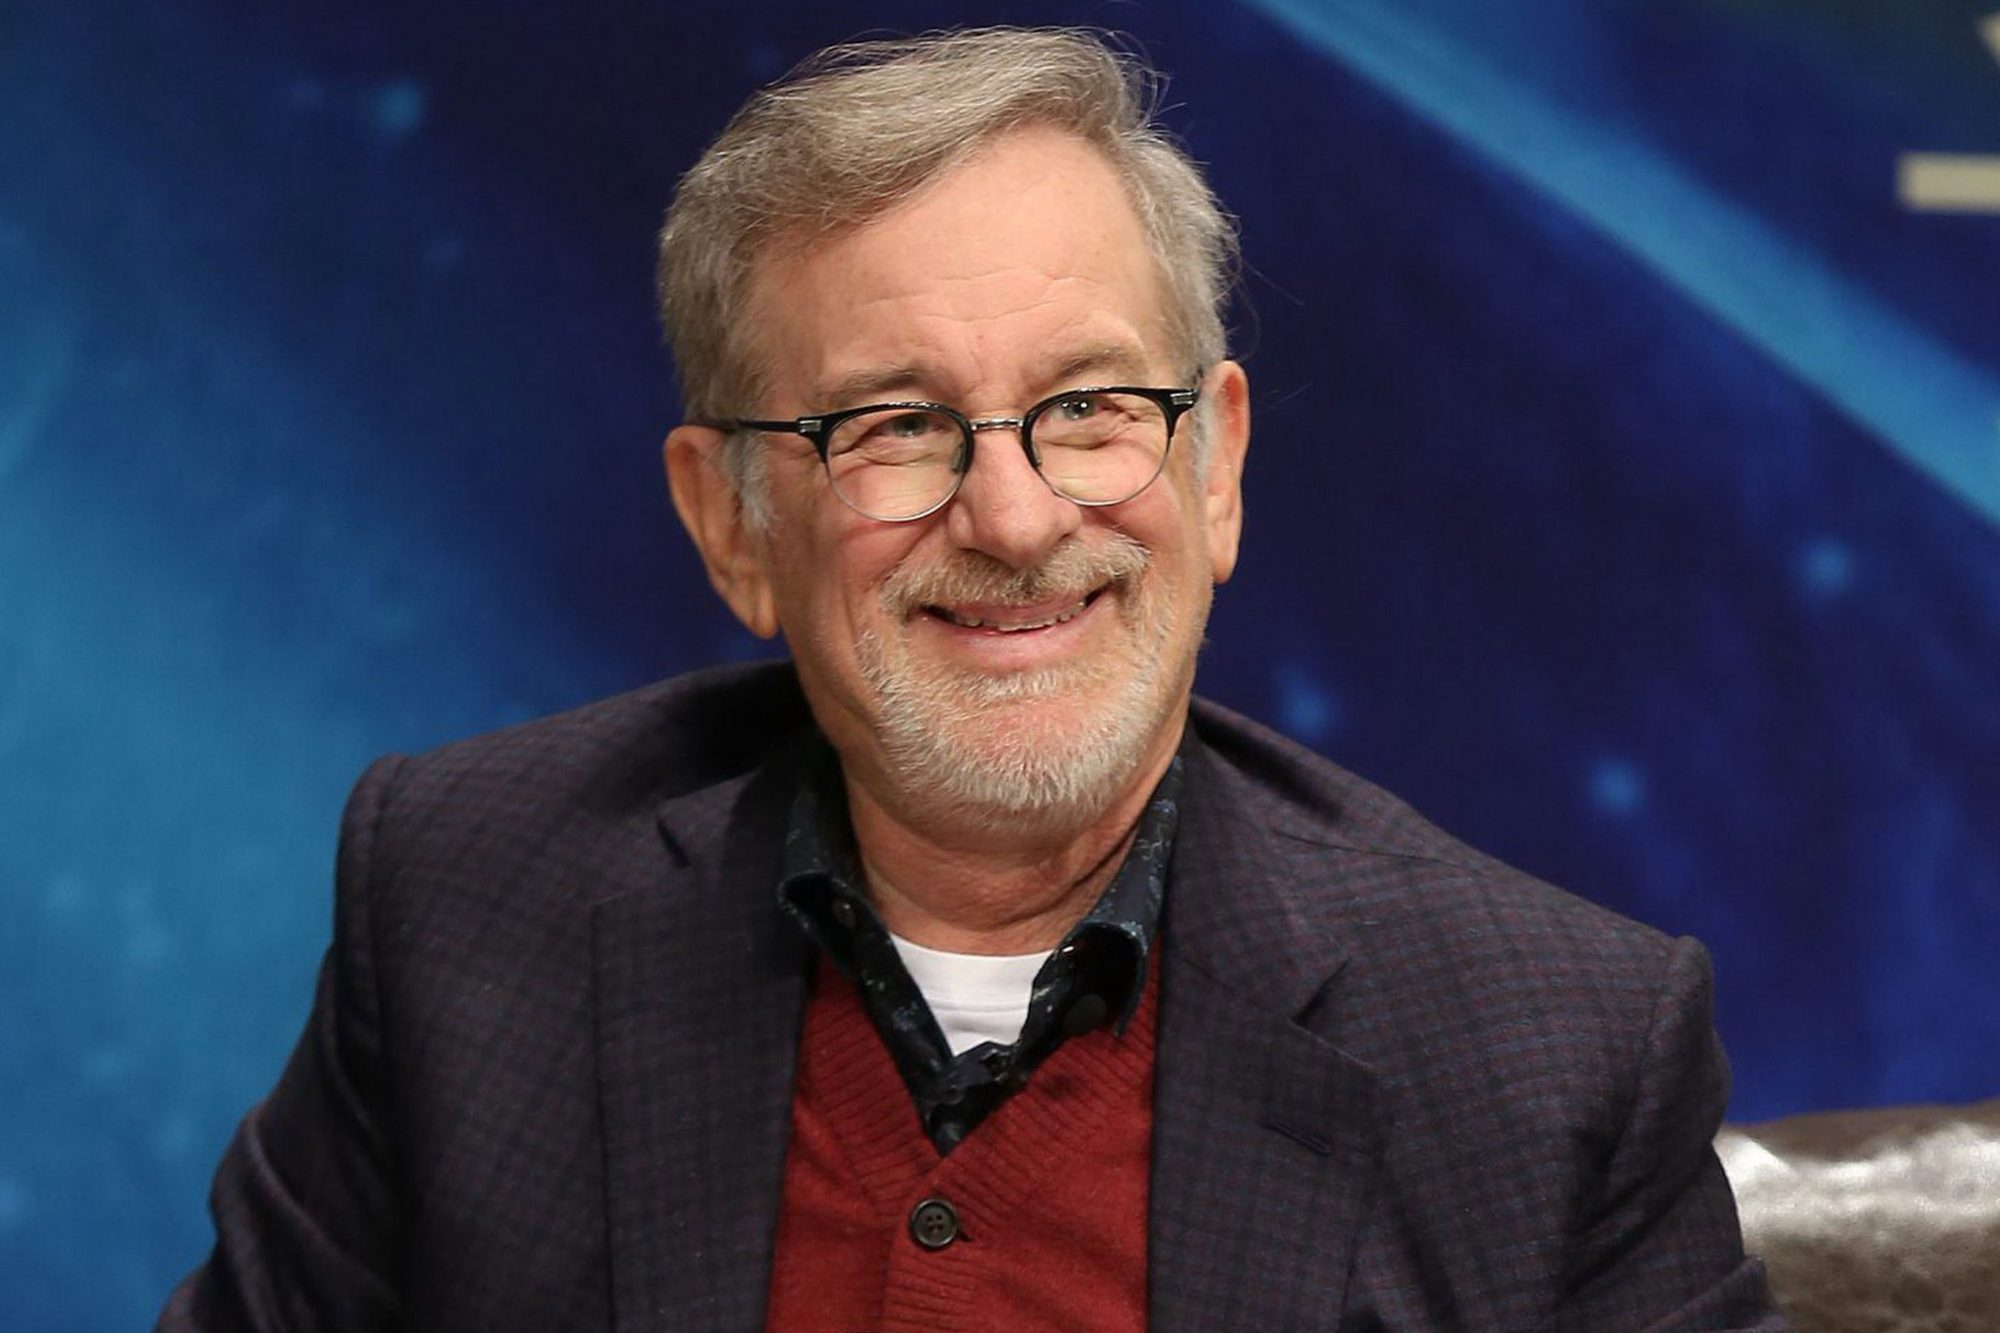 Steven Spielberg Attends Promotional Event For Film In Beijing